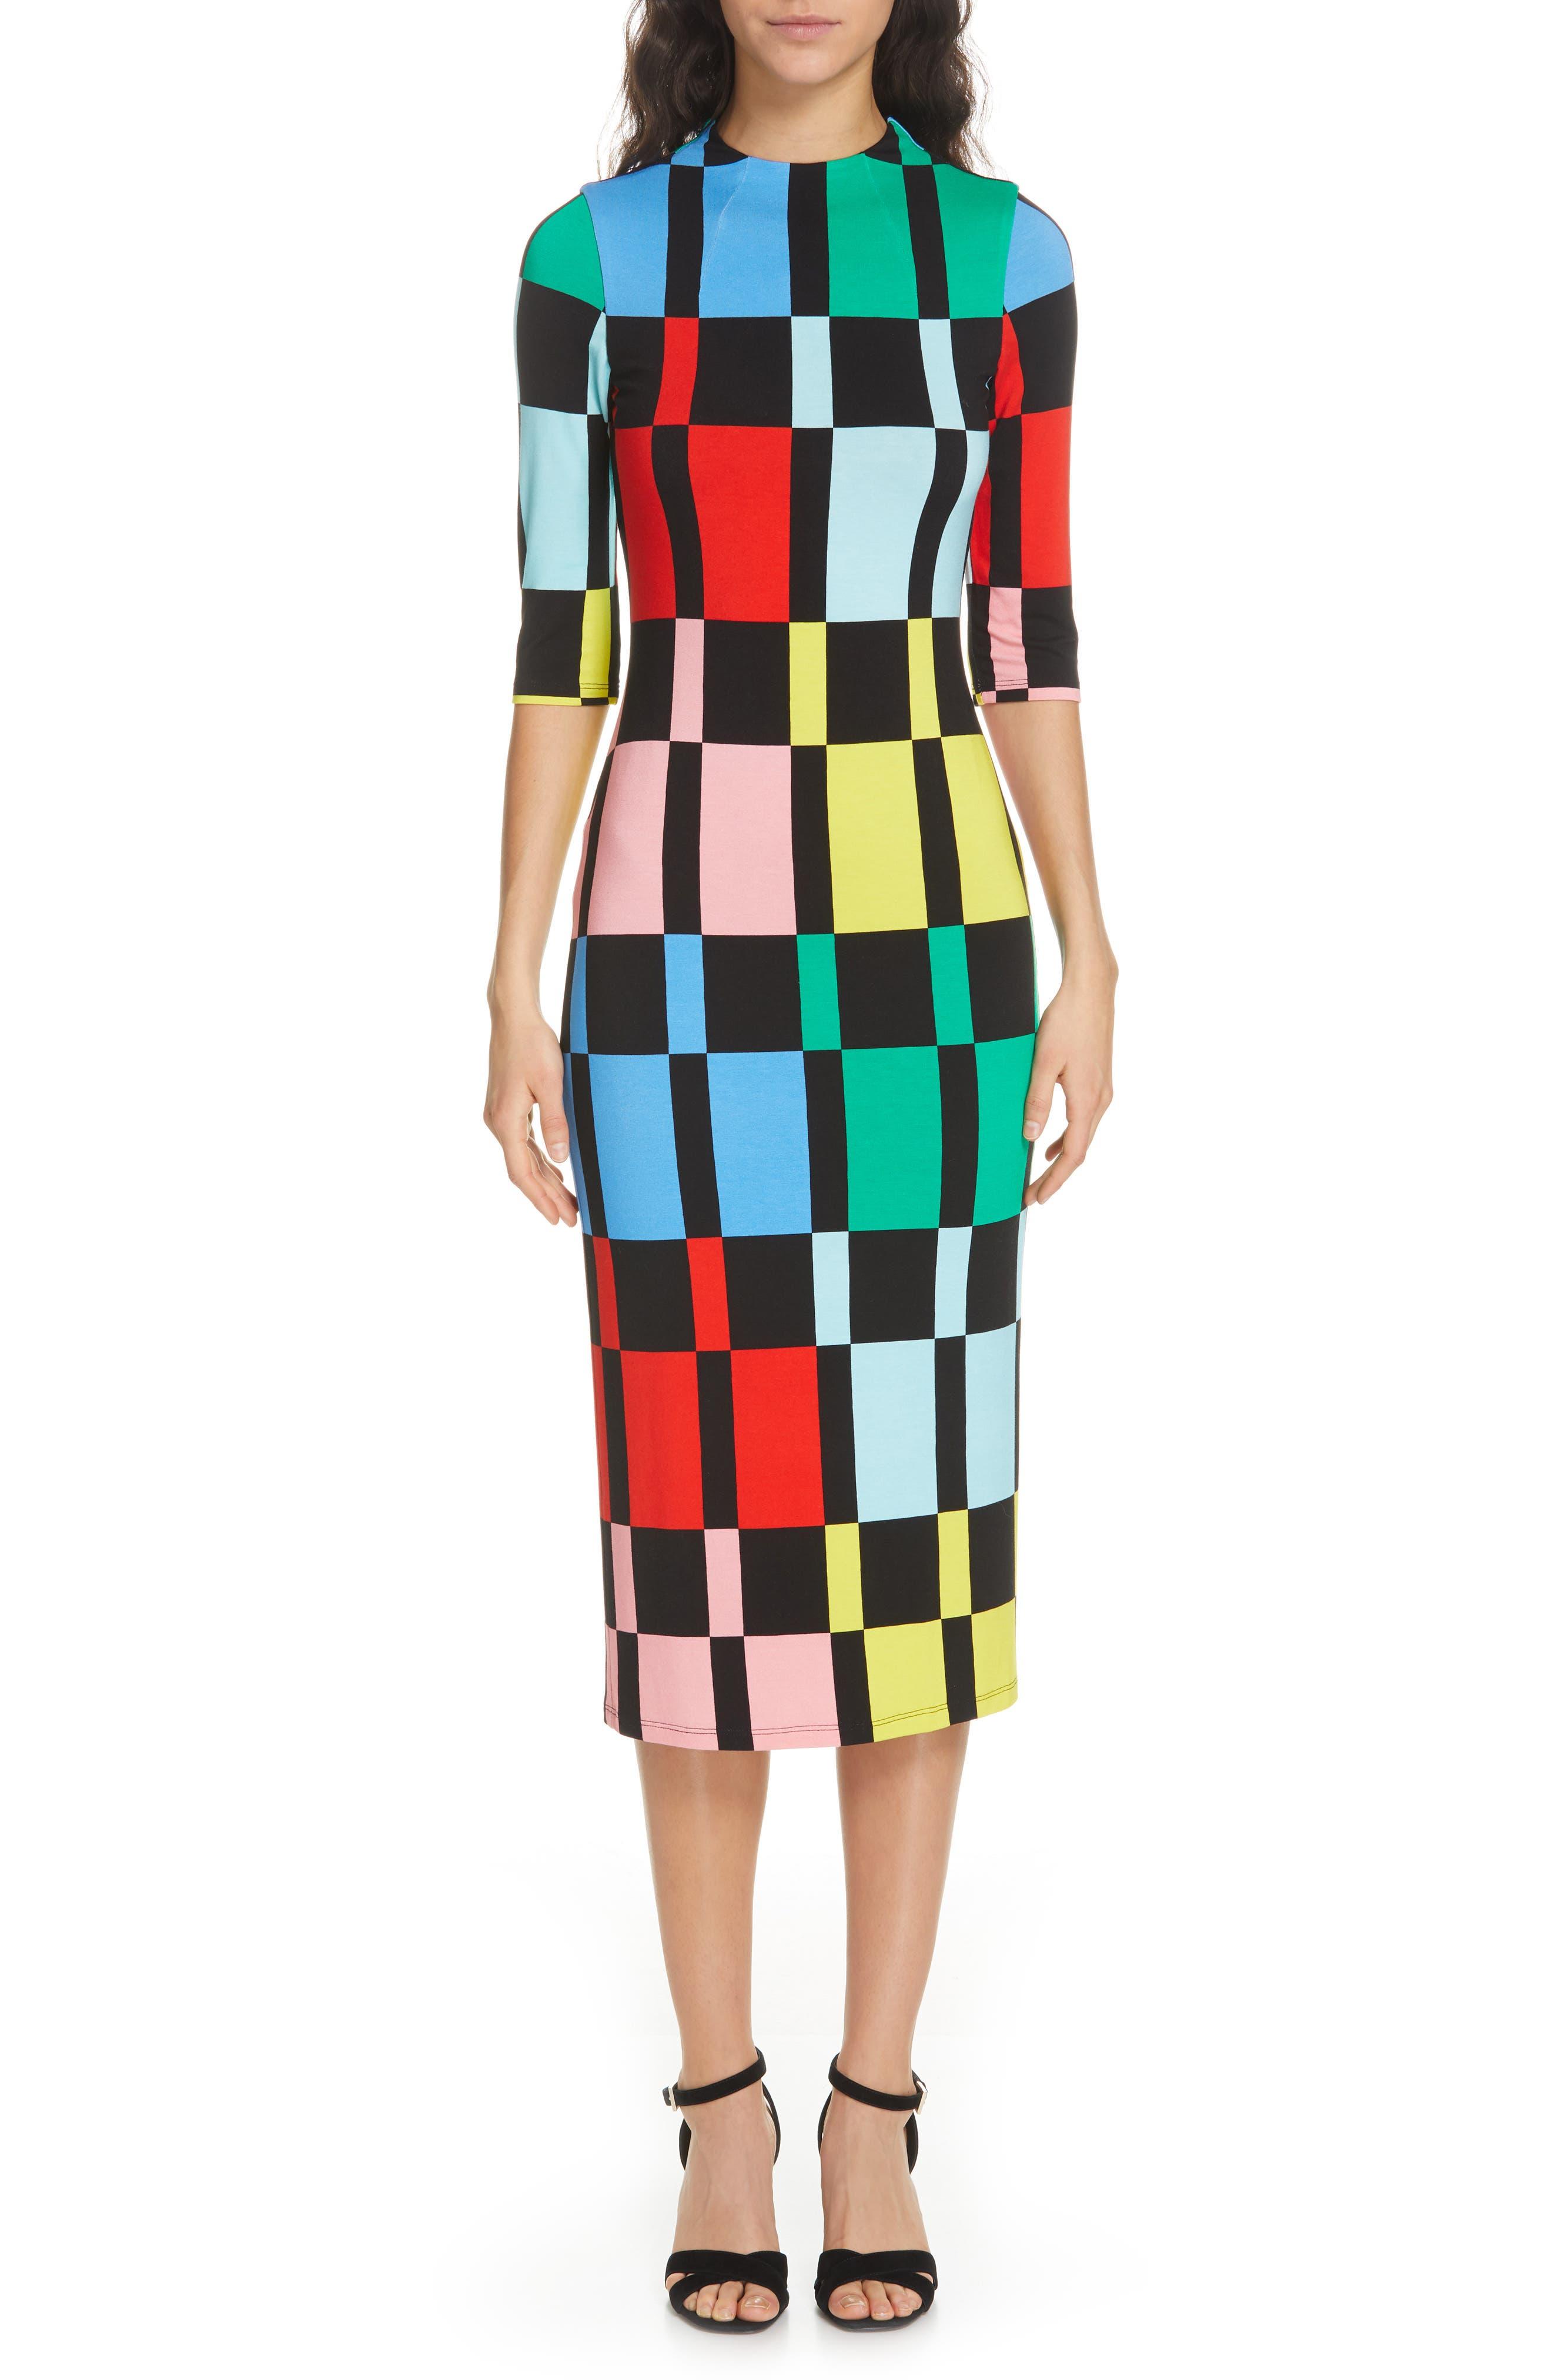 Alice + Olivia Delora Fitted Dress, Black